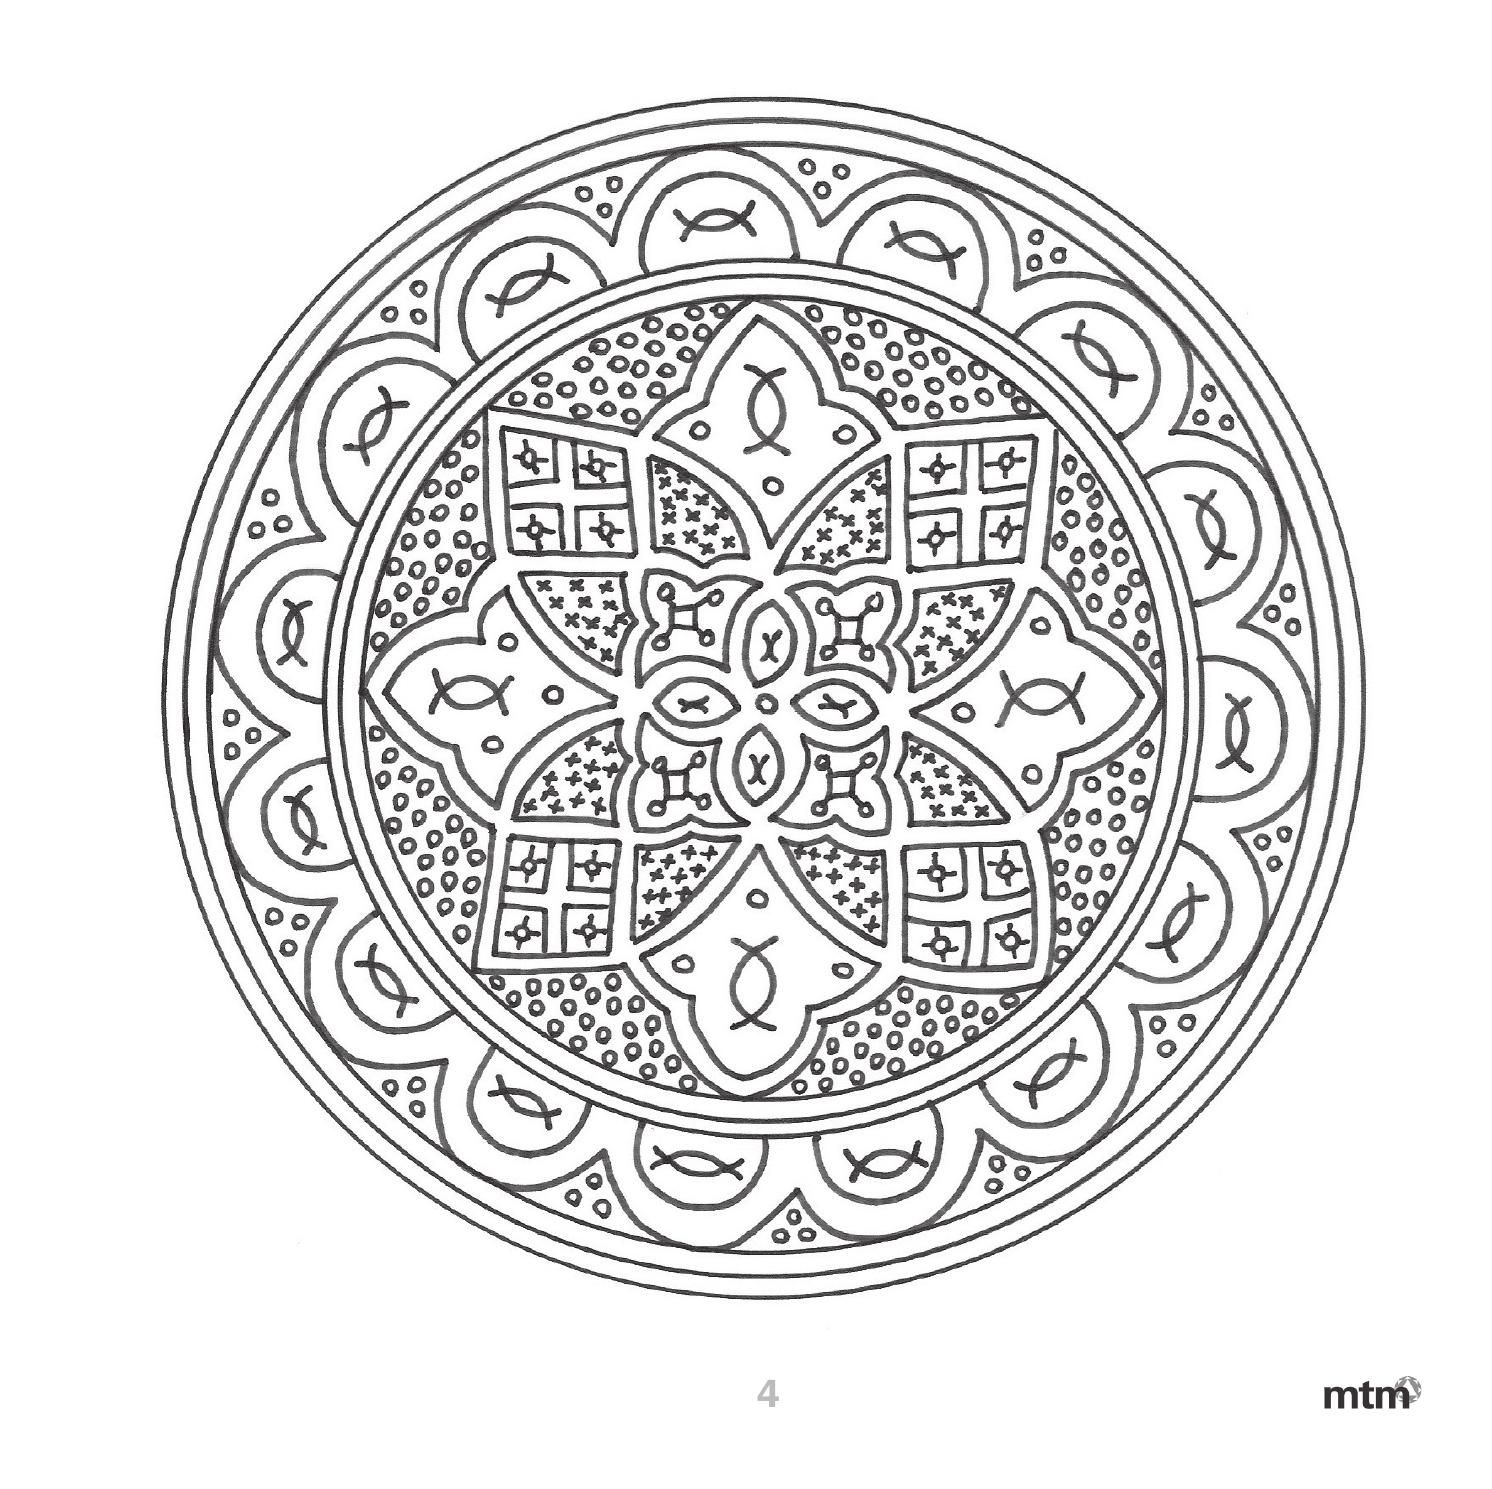 Arte Andaluz En Mandalas Mtm Editores Dia De Andalucia Mandalas Cuadernos De Matematicas